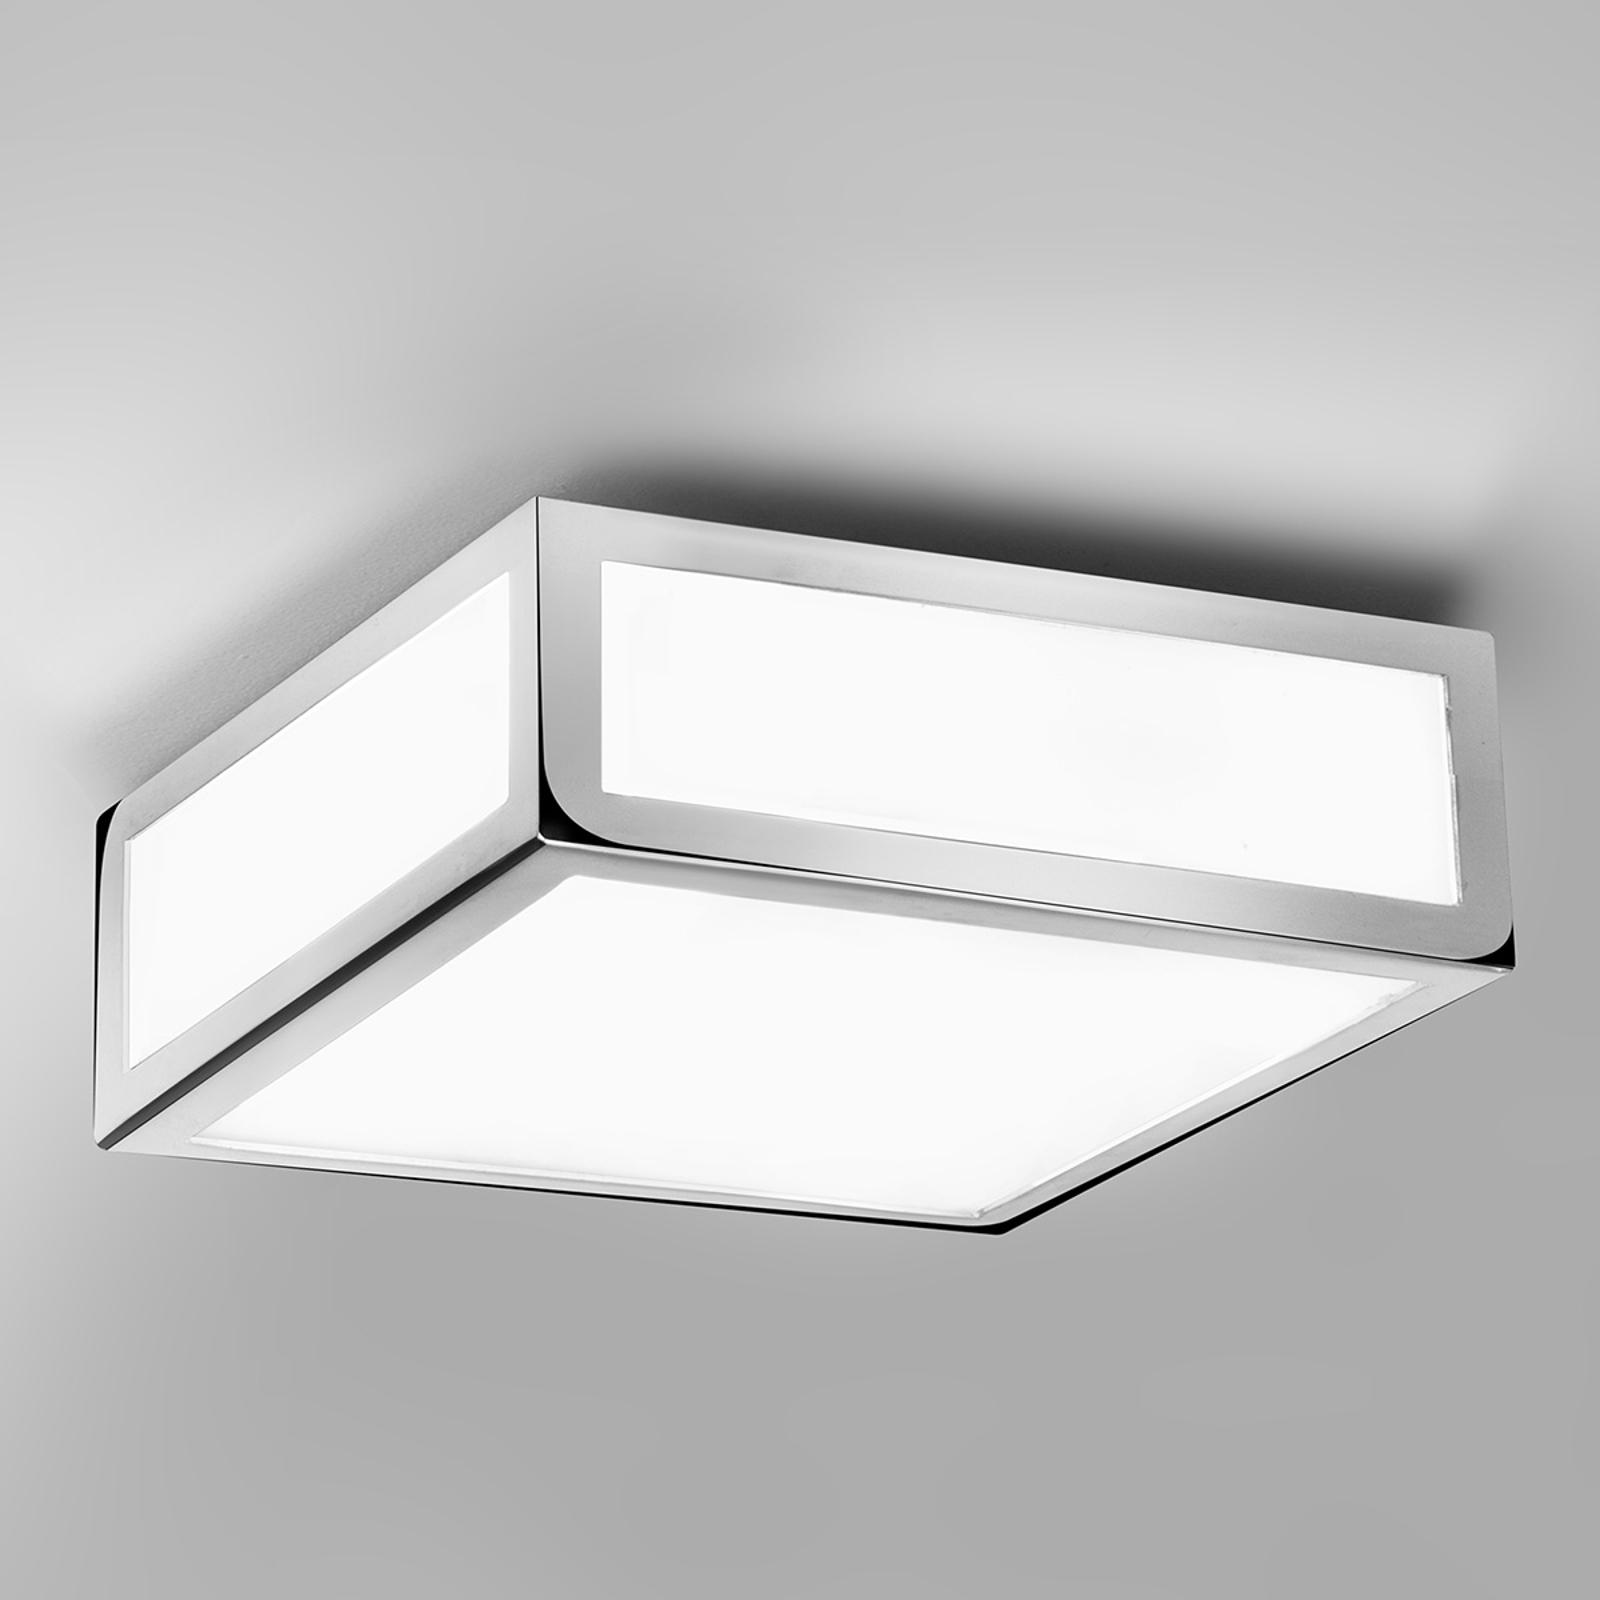 Mashiko Ceiling Light Simple 20 x 20 cm_1020302_1